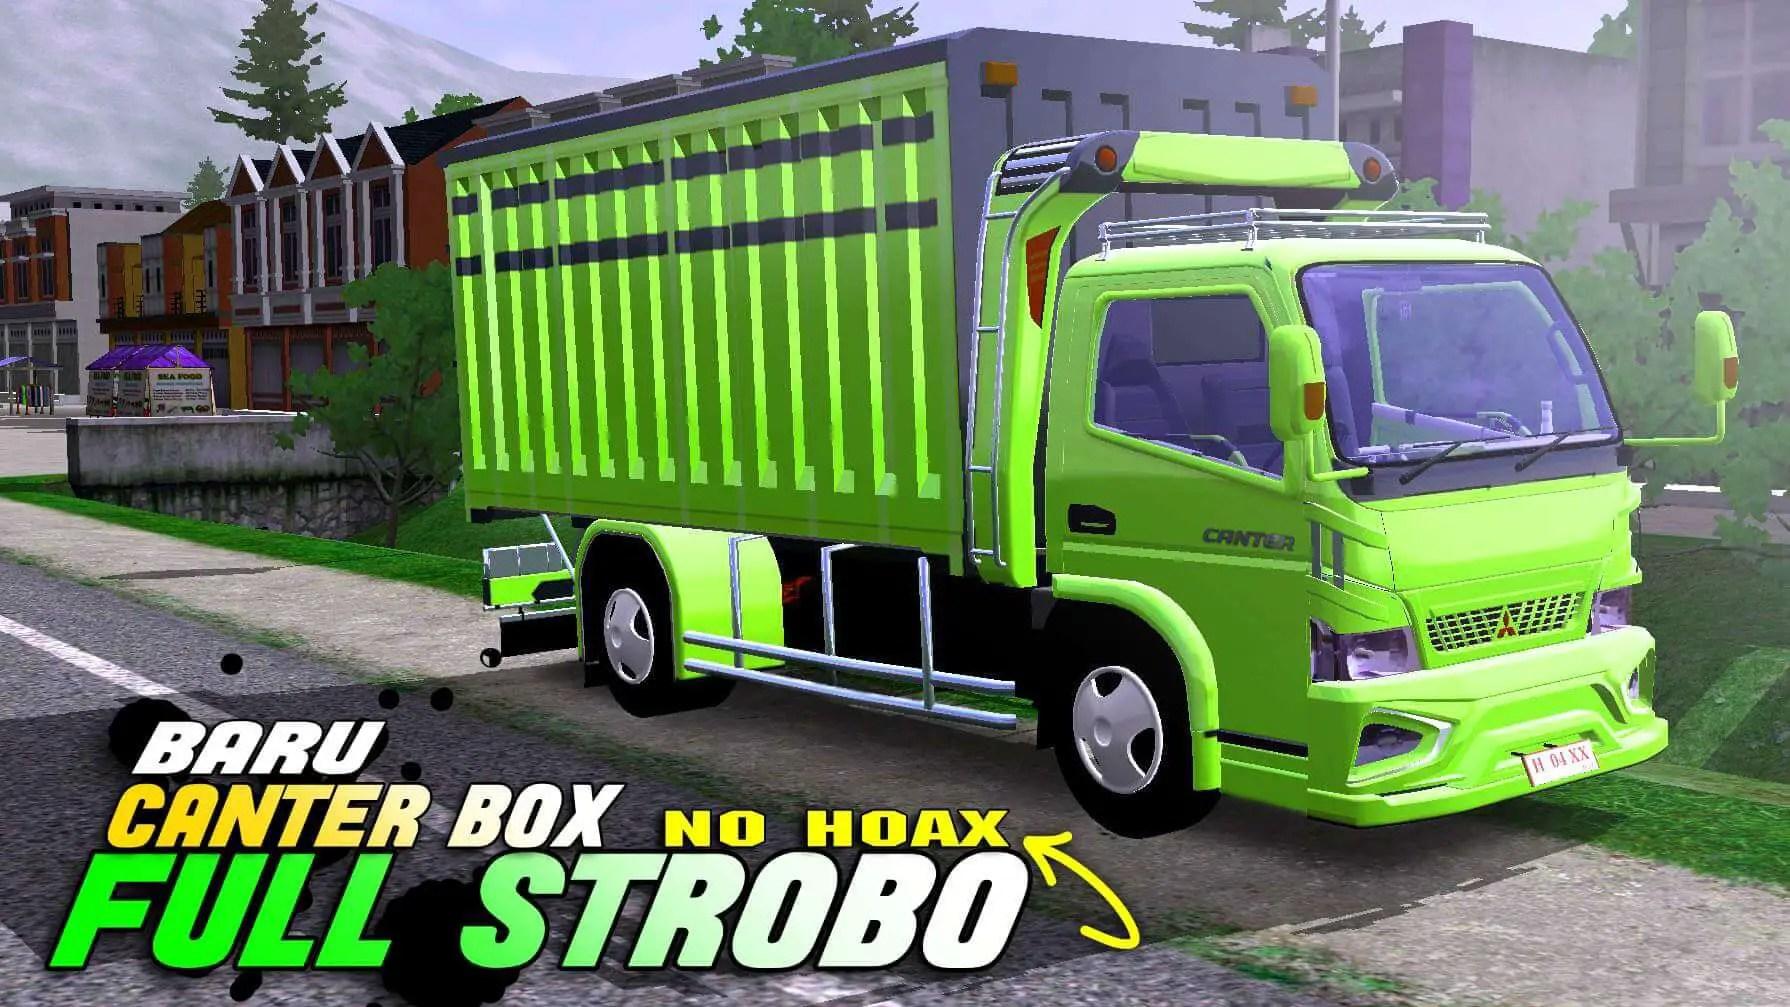 Canter Box,Mod Canter Box,Canter Box Mod BUSSID,Canter Box Mod for BUSSID,Mod Canter Box BUSSID, BUSSID Mod, Mod, Mod for bussid,SGCArena,